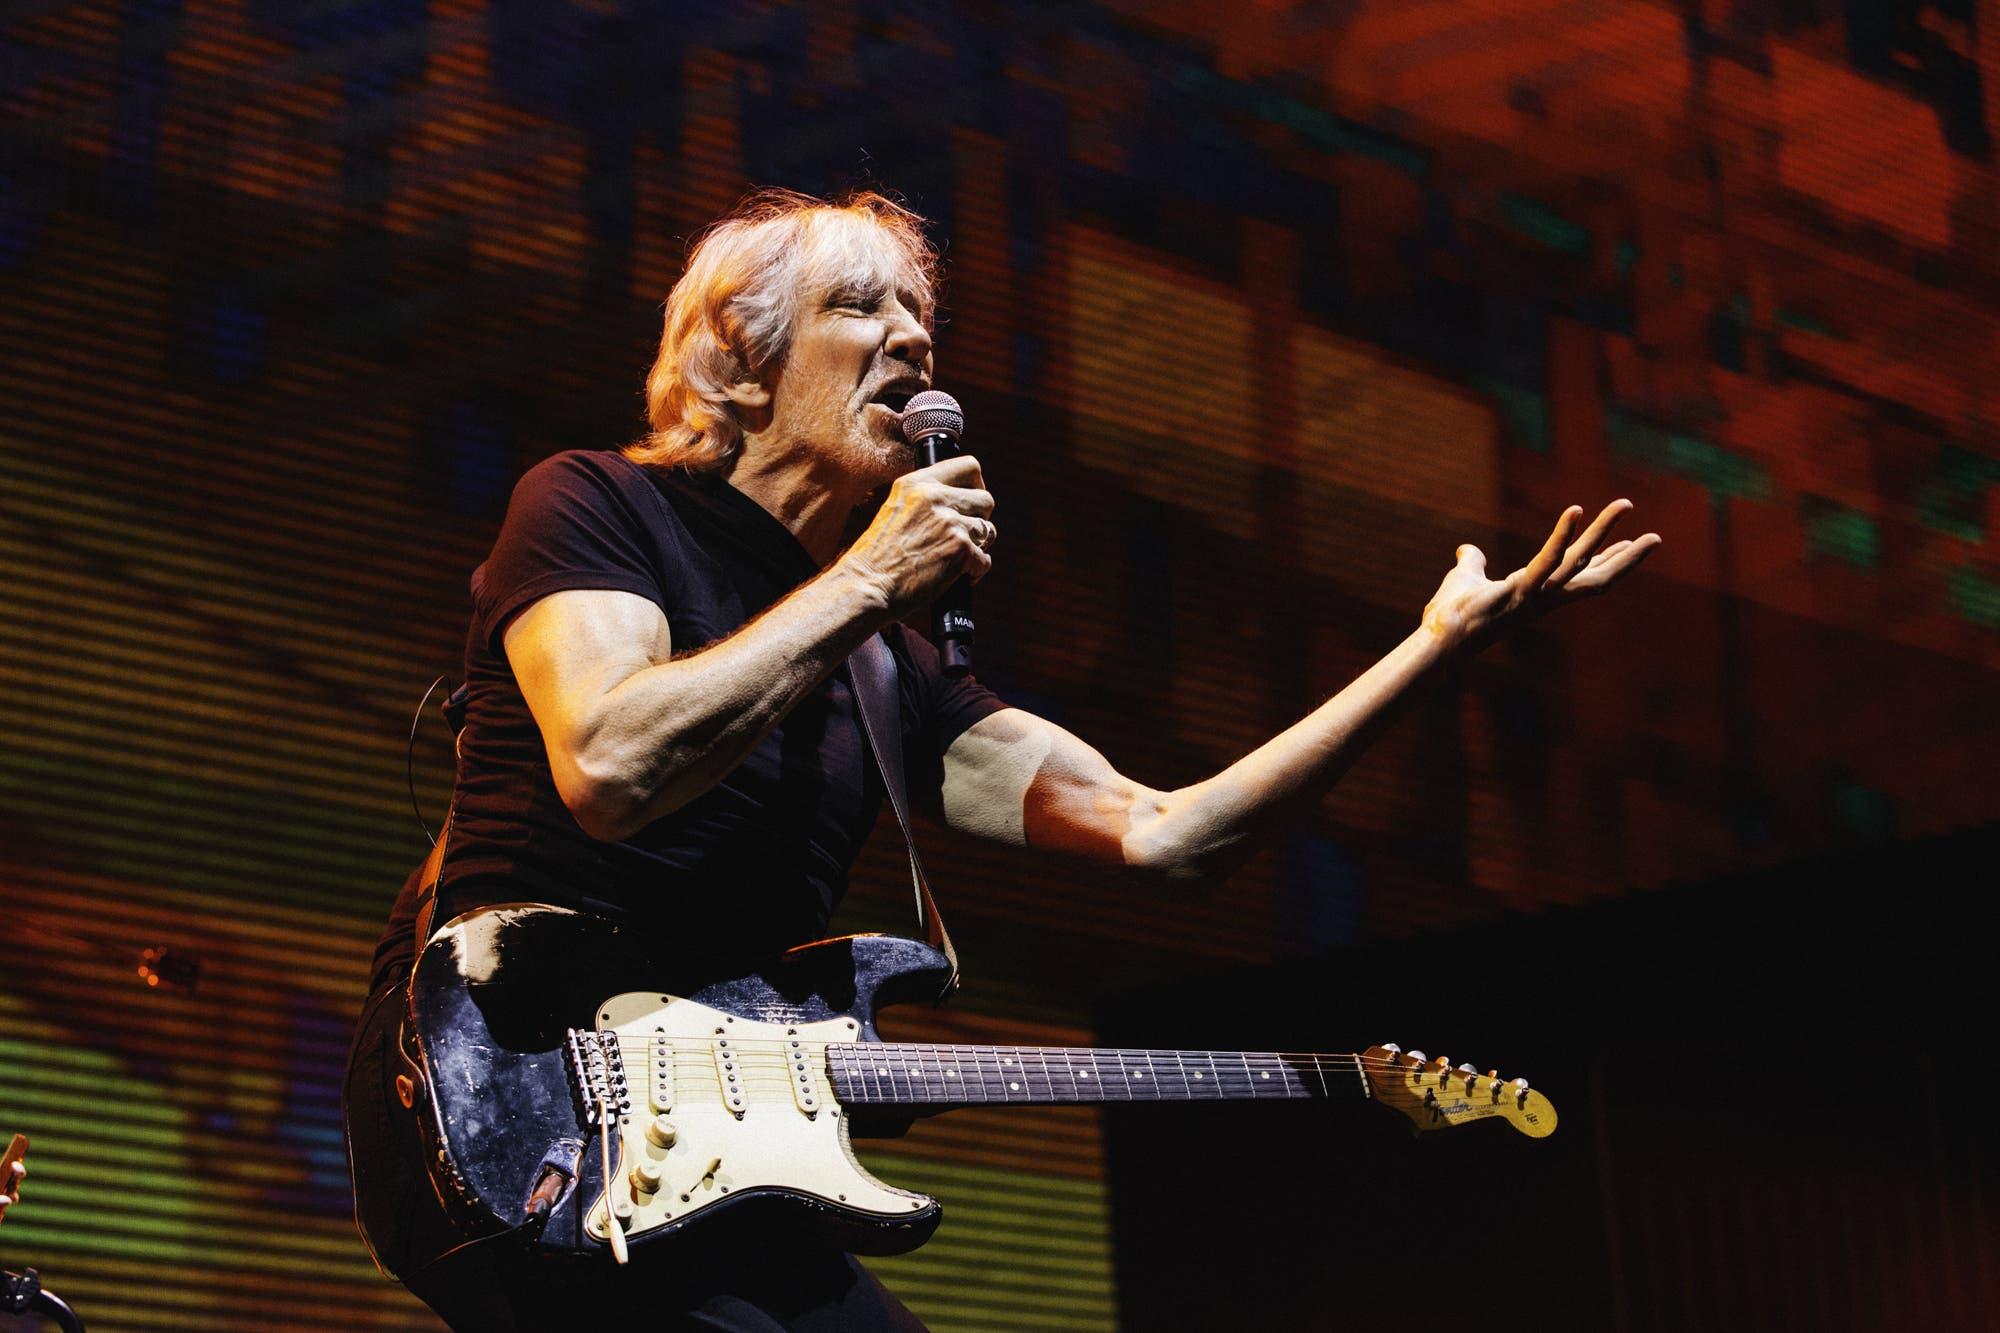 Durante un show en San Pablo, Roger Waters criticó duramente a Jair Bolsonaro